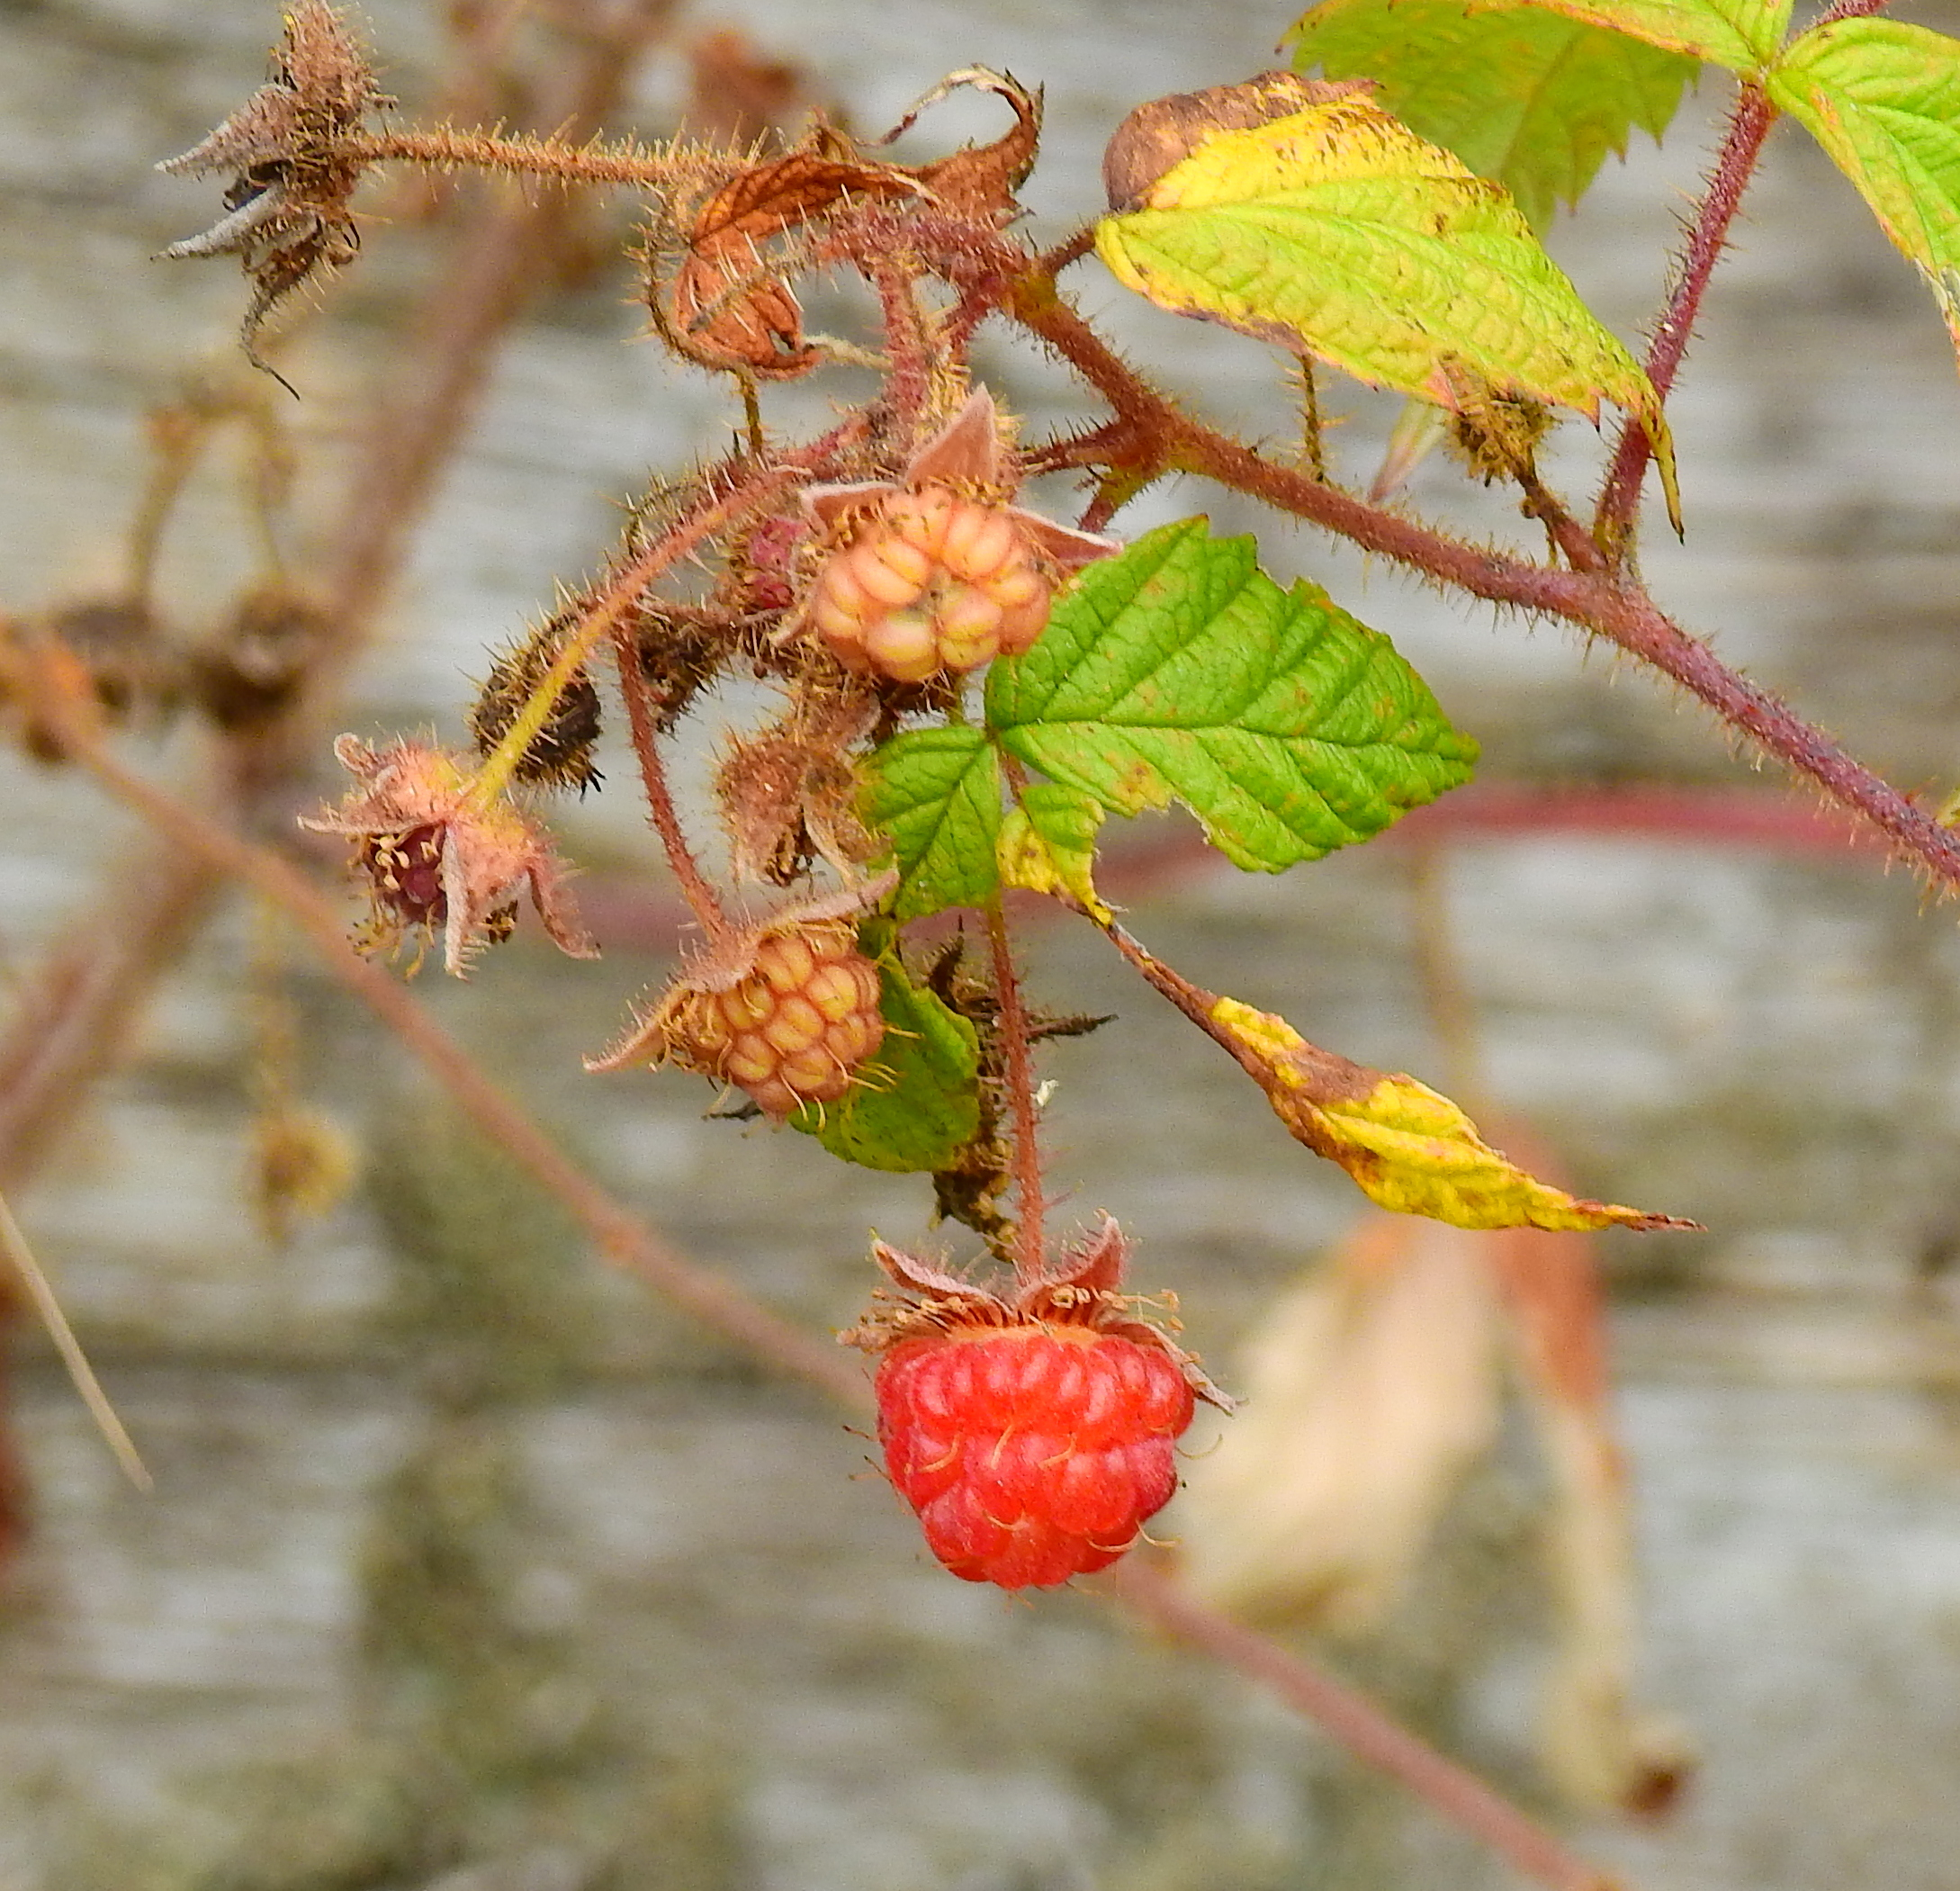 maineraspberrysingle